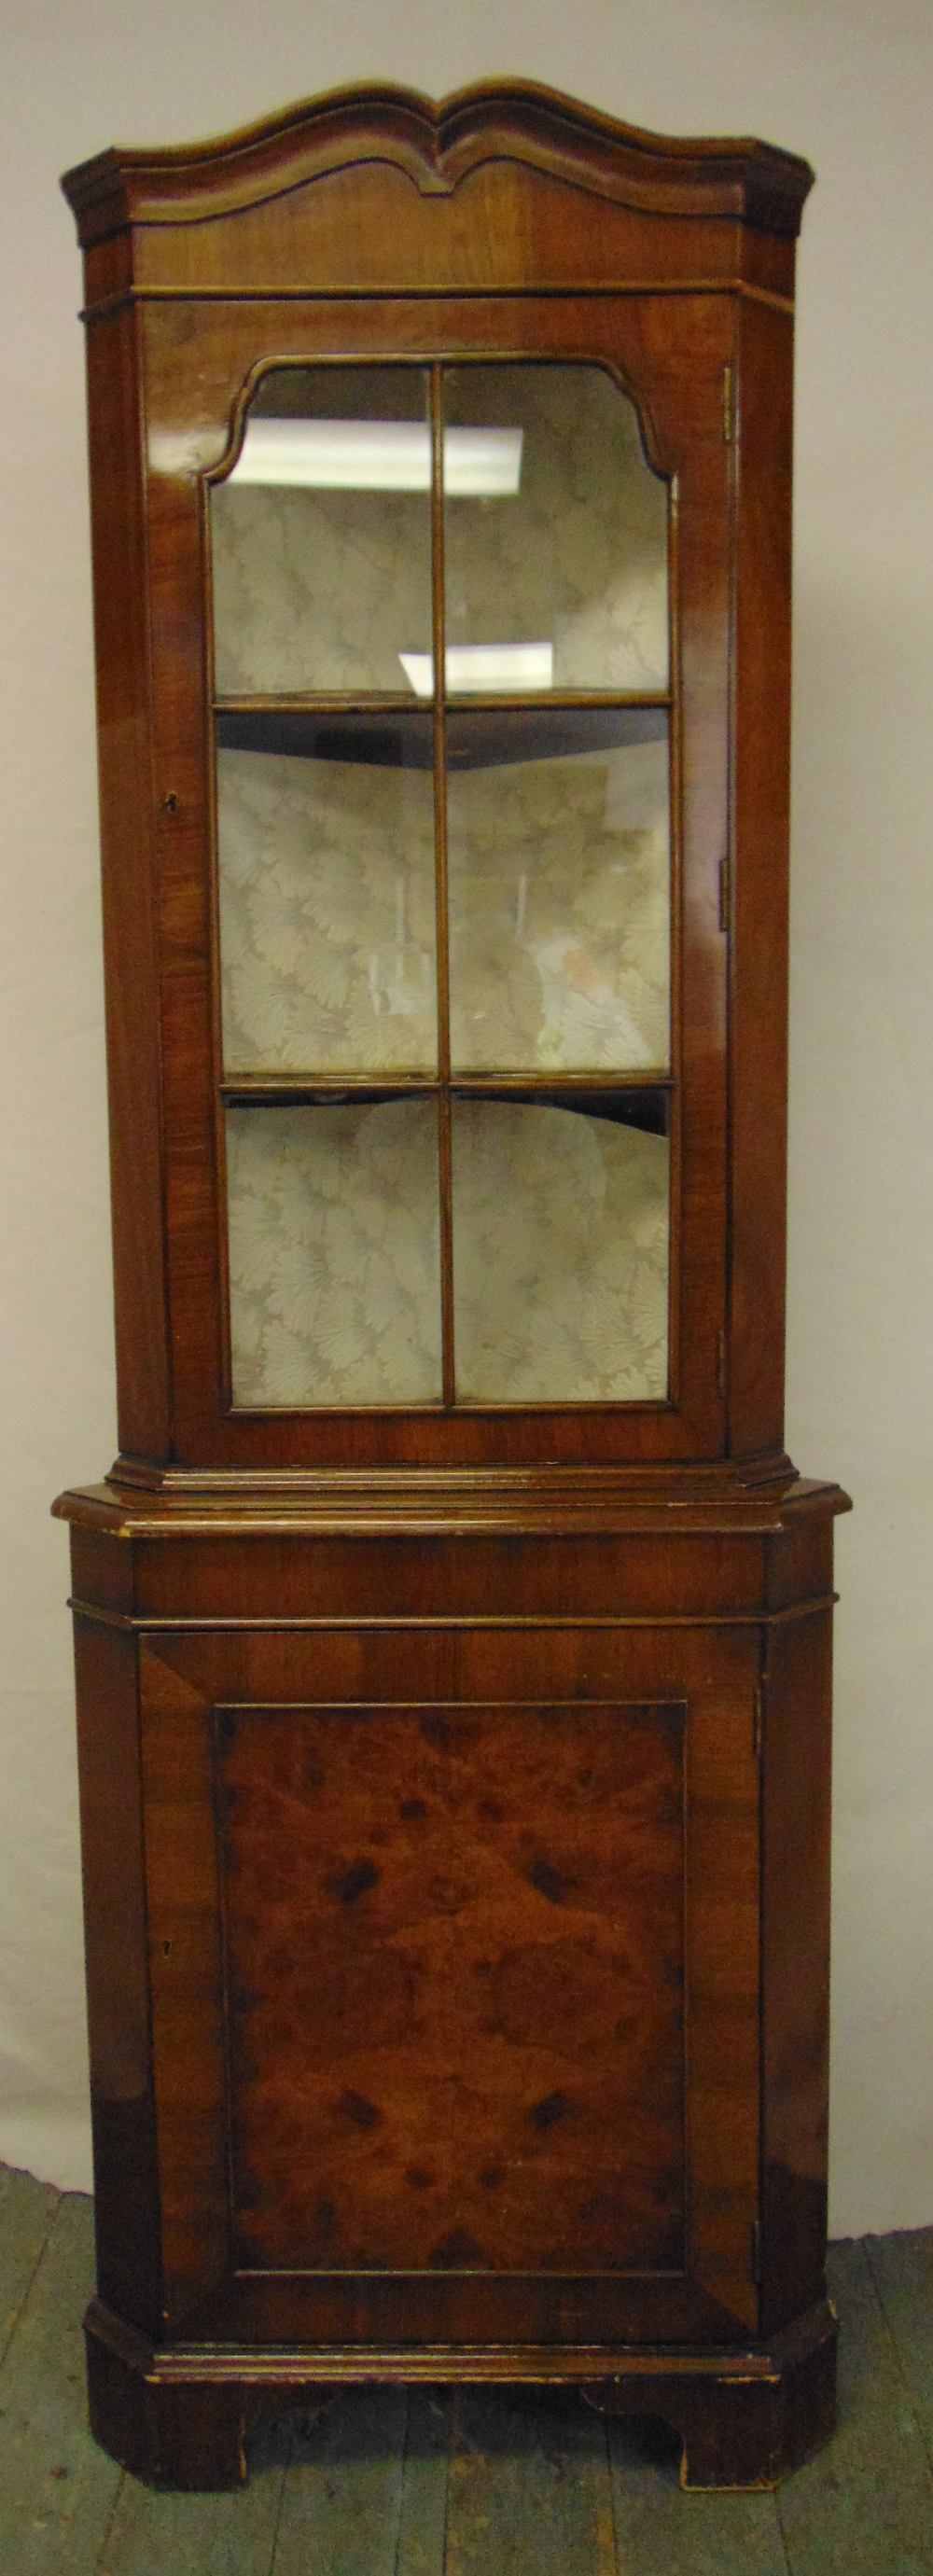 Lot 14 - An Edwardian mahogany glazed corner cabinet on four bracket feet